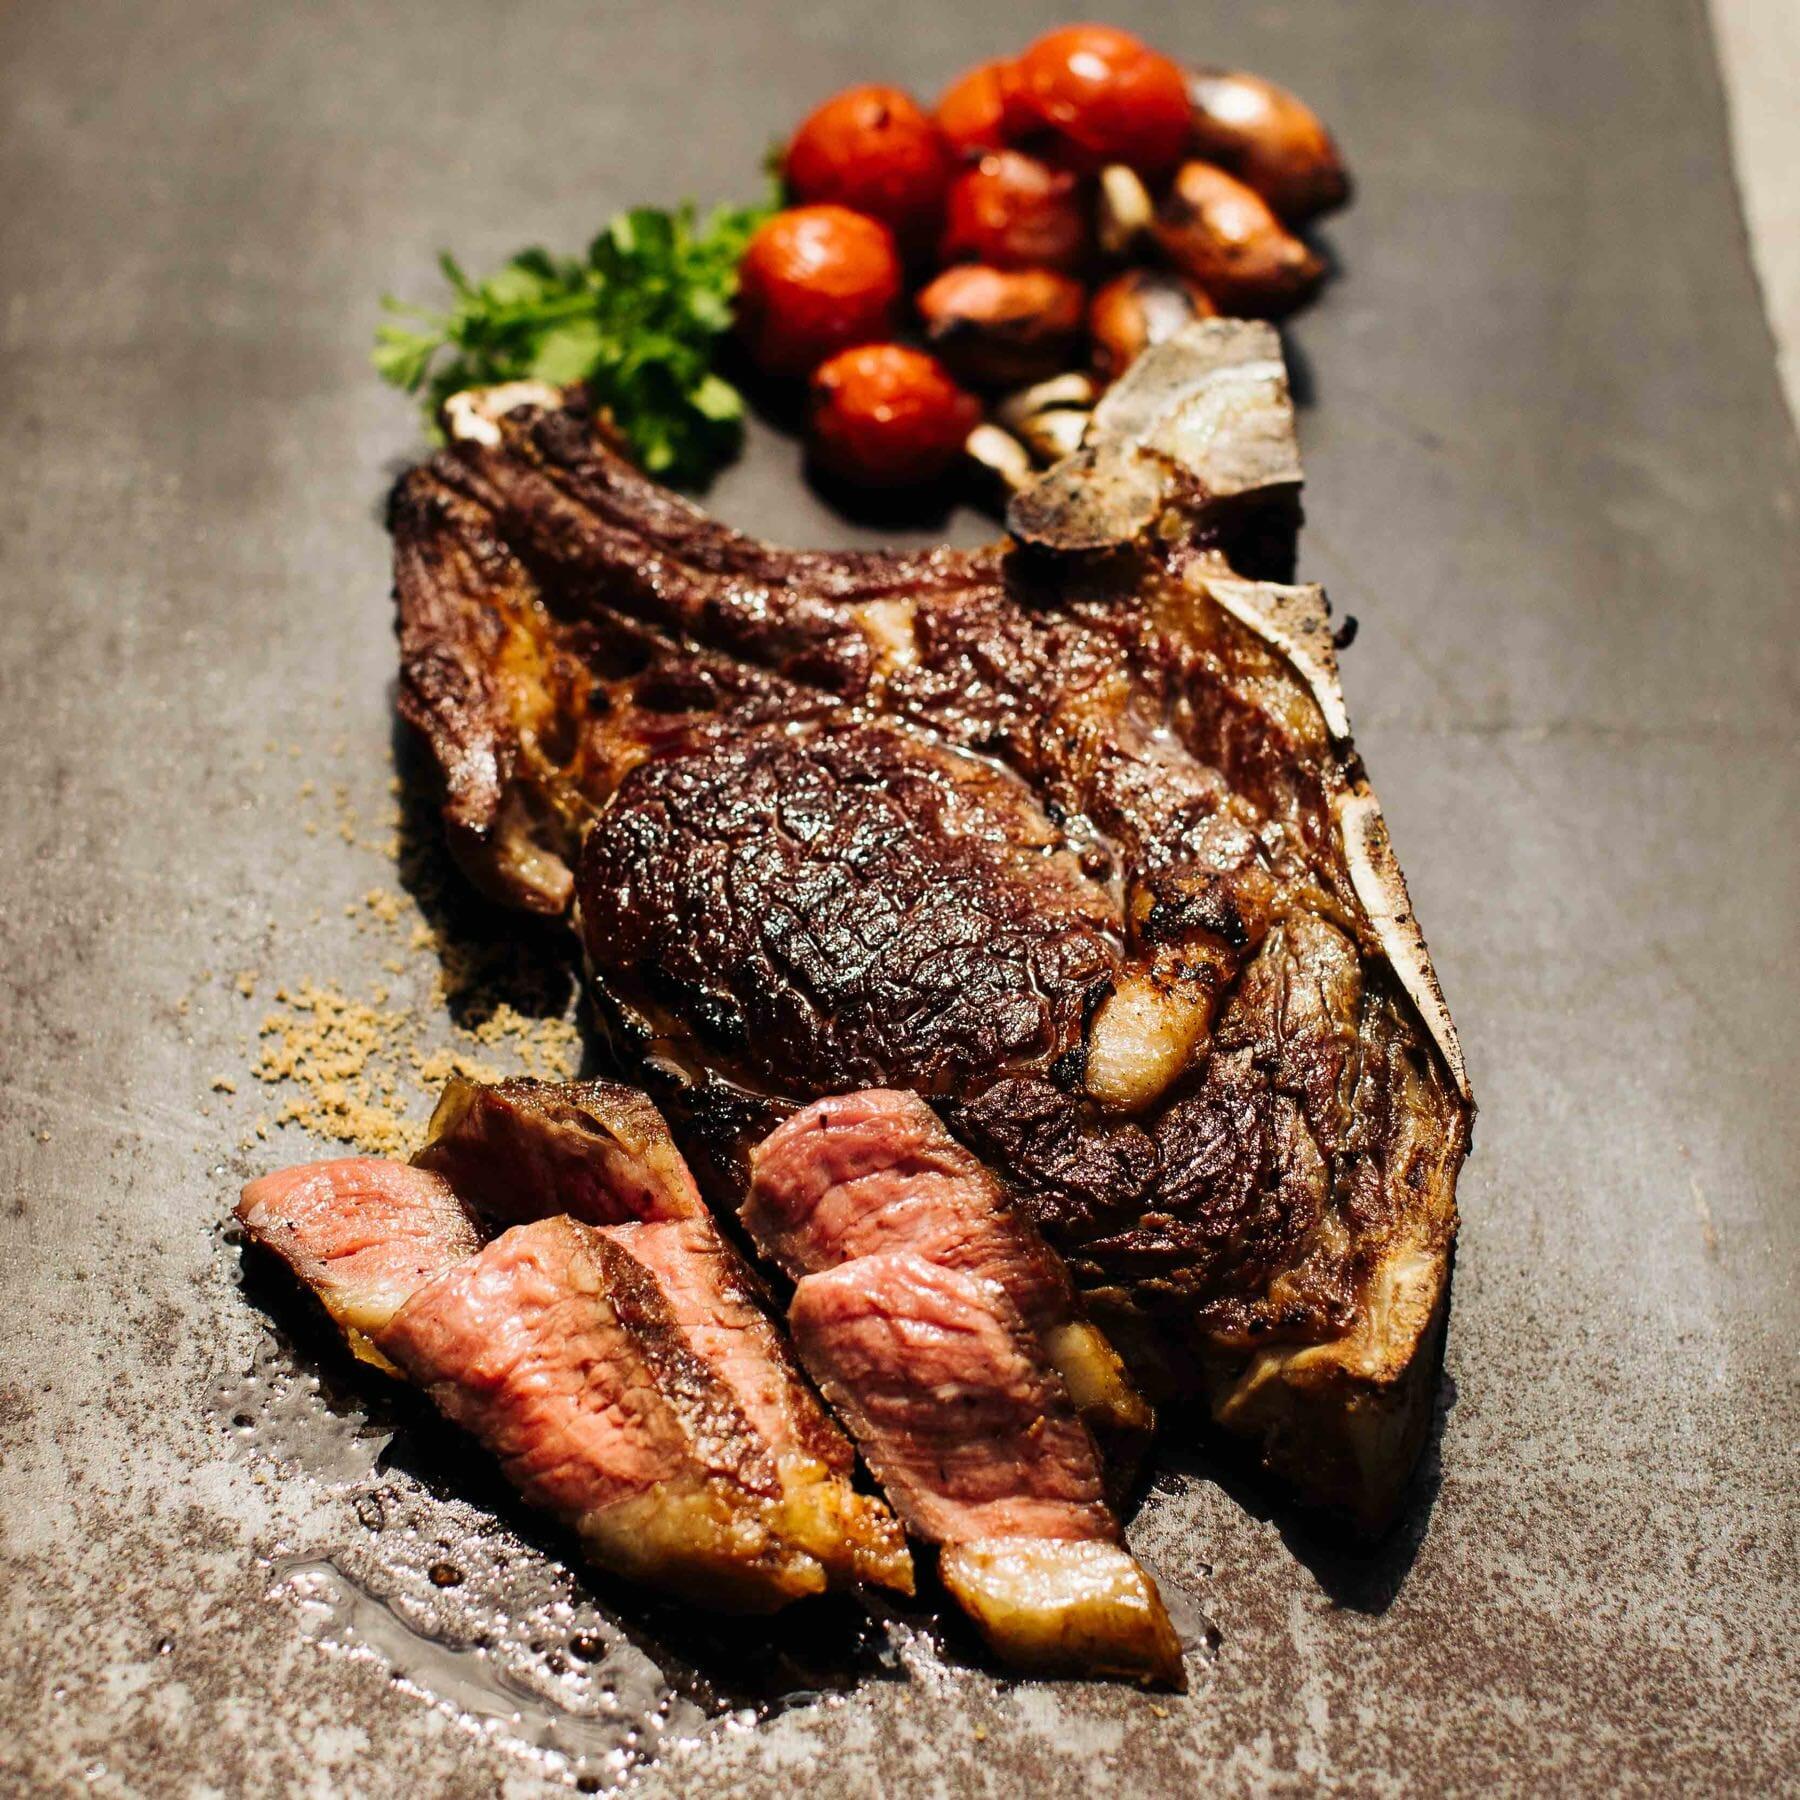 Gegrilltes Steak Thai-Style mit Grill-Tomaten-Sauce - Suea Ronghai